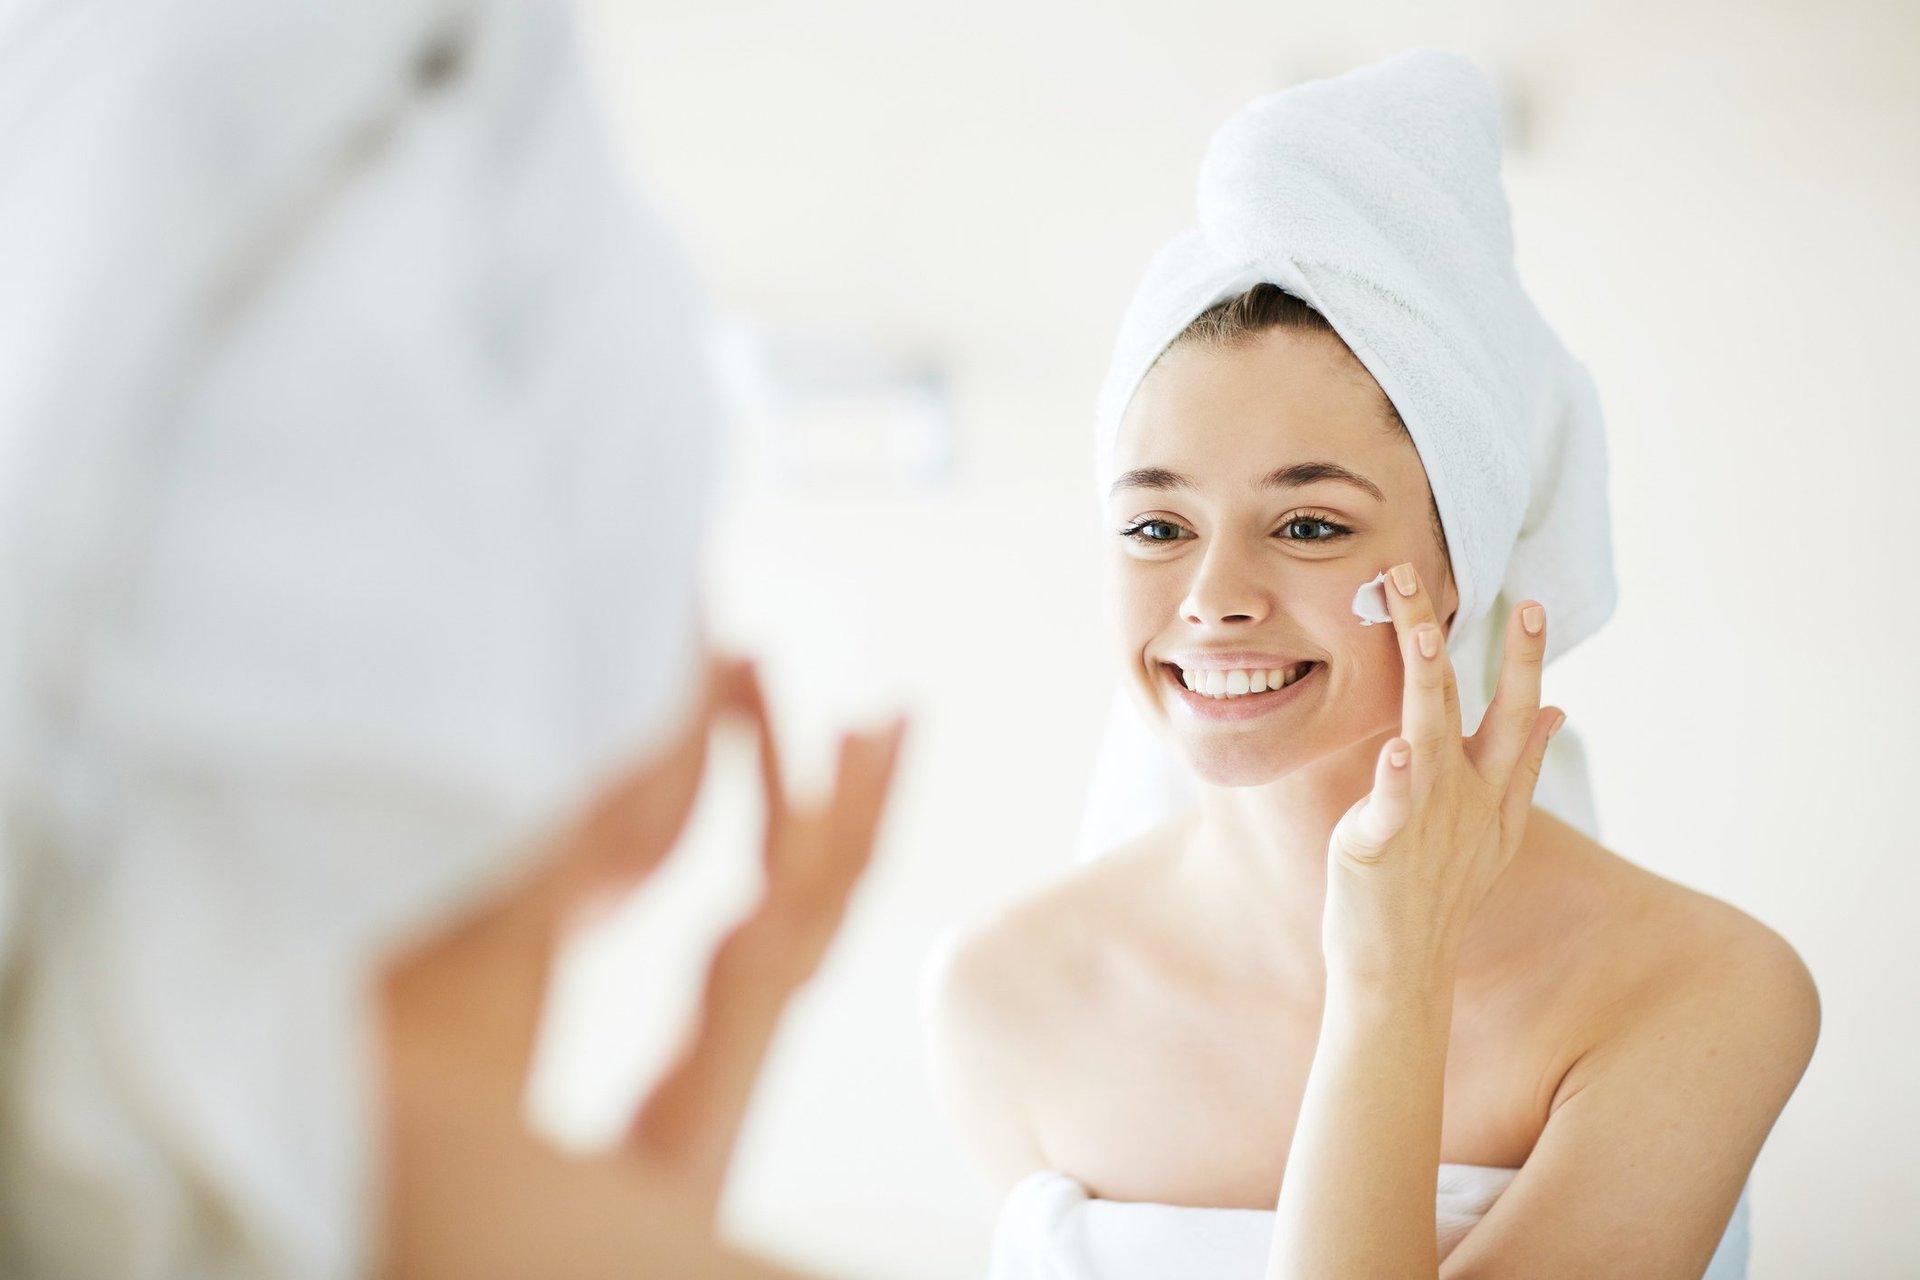 Dr. Michael Workman, facial care, body augmentation, expert treatments